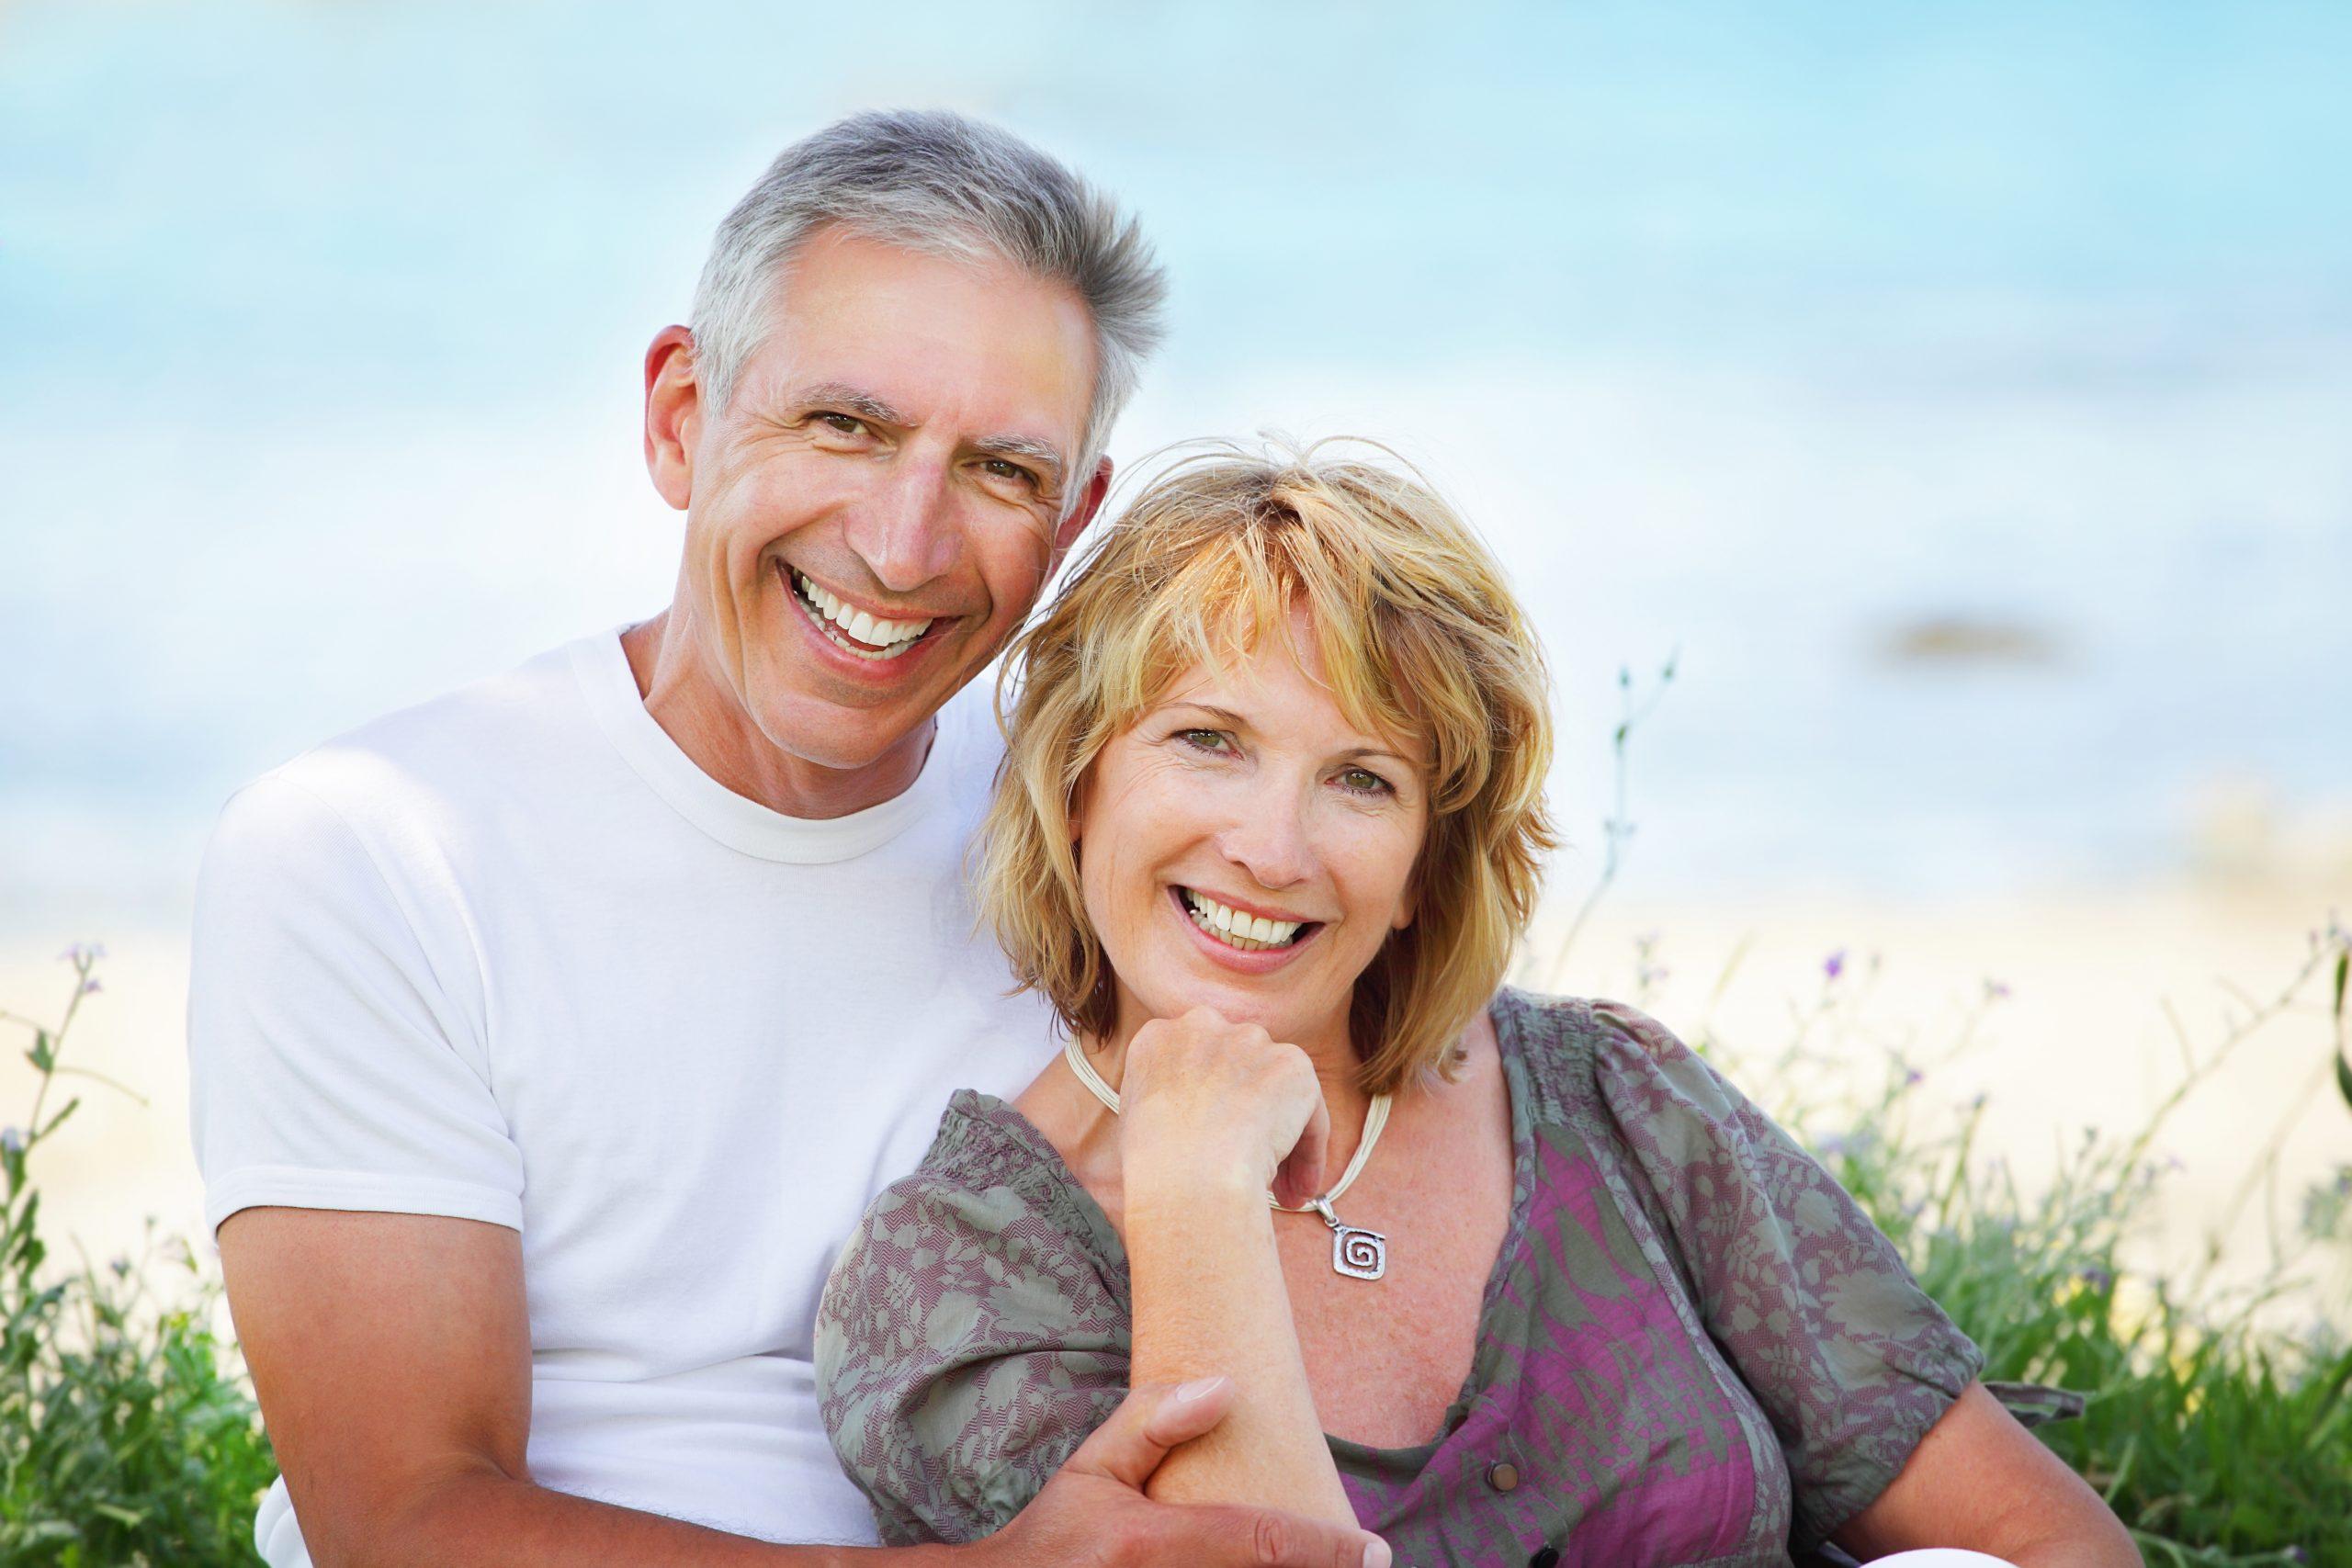 estética dental y prótesis dentales